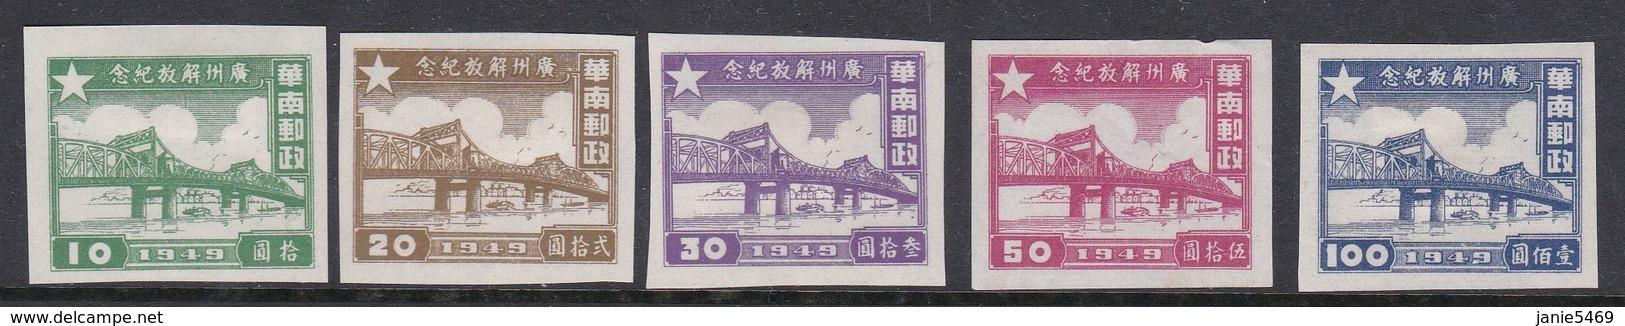 China South China Scott 7L1-7L5 1949 Pearl River Bridge, Mint Hinged - Zuid-China 1949-50